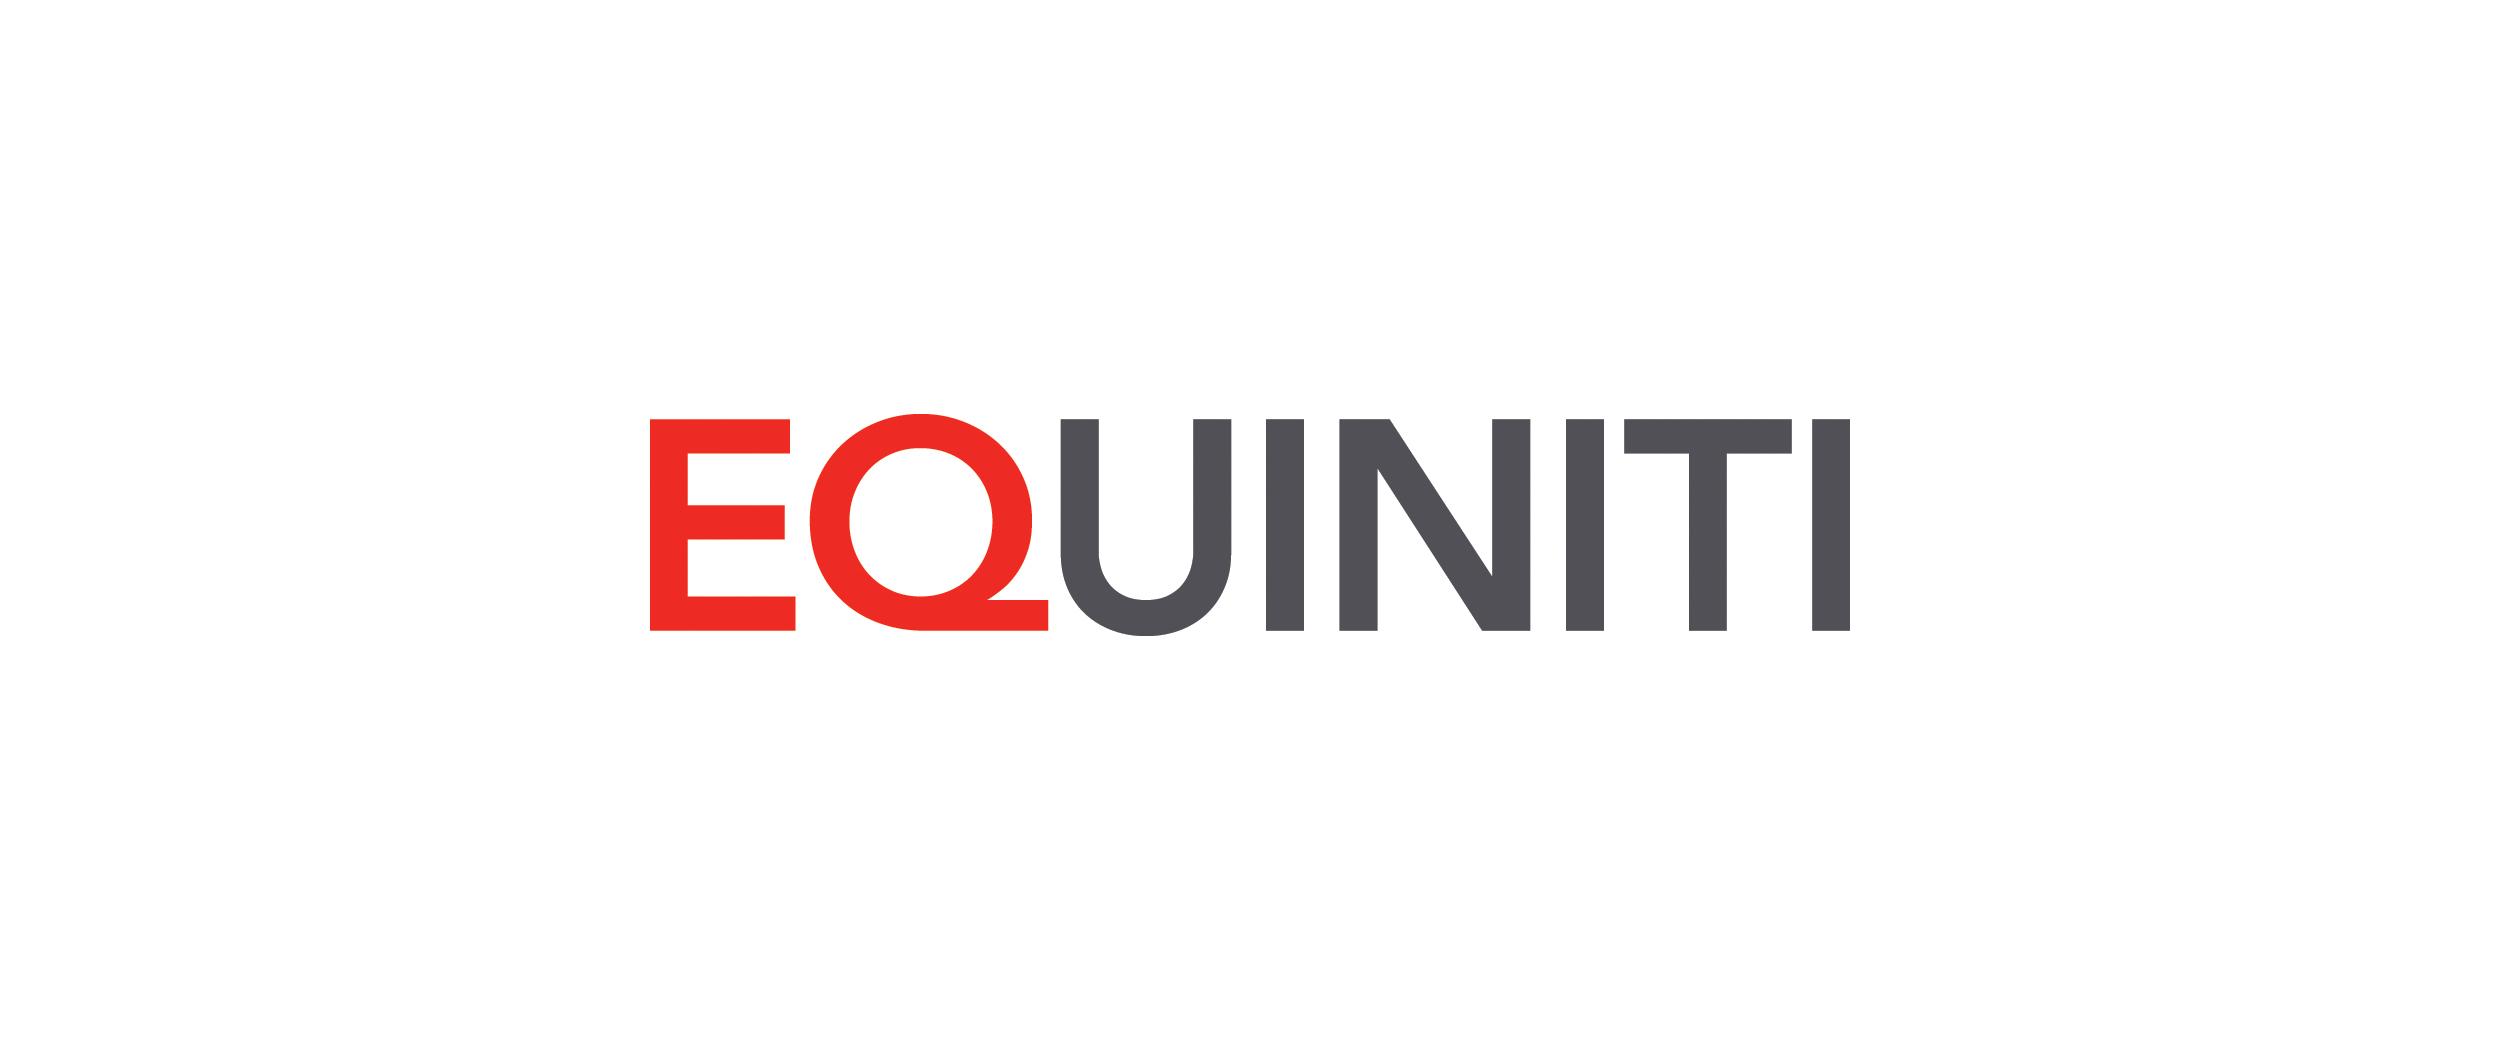 Equiniti_Logo copy.jpg